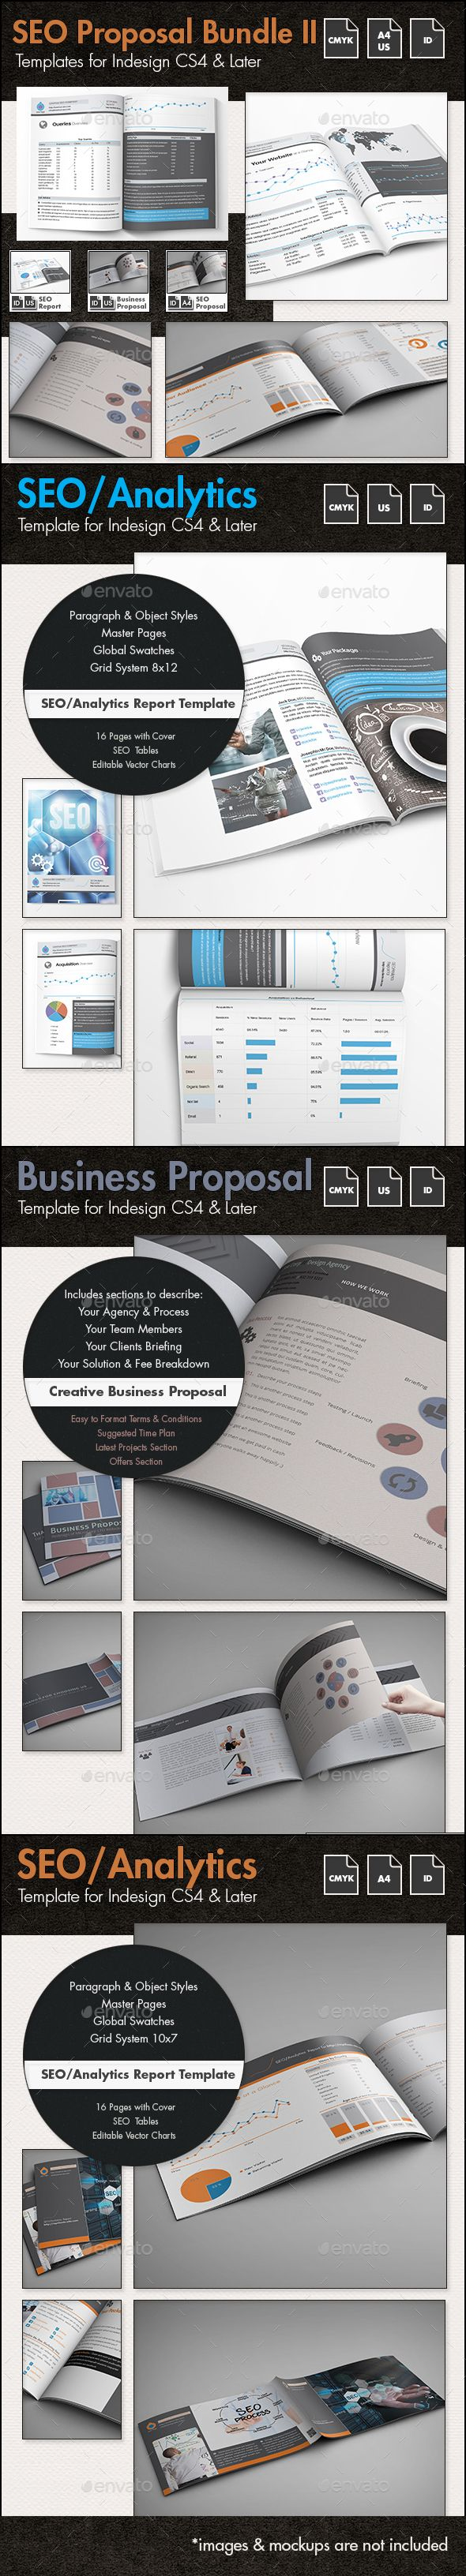 SEO - Business Proposal Templates Bundle II